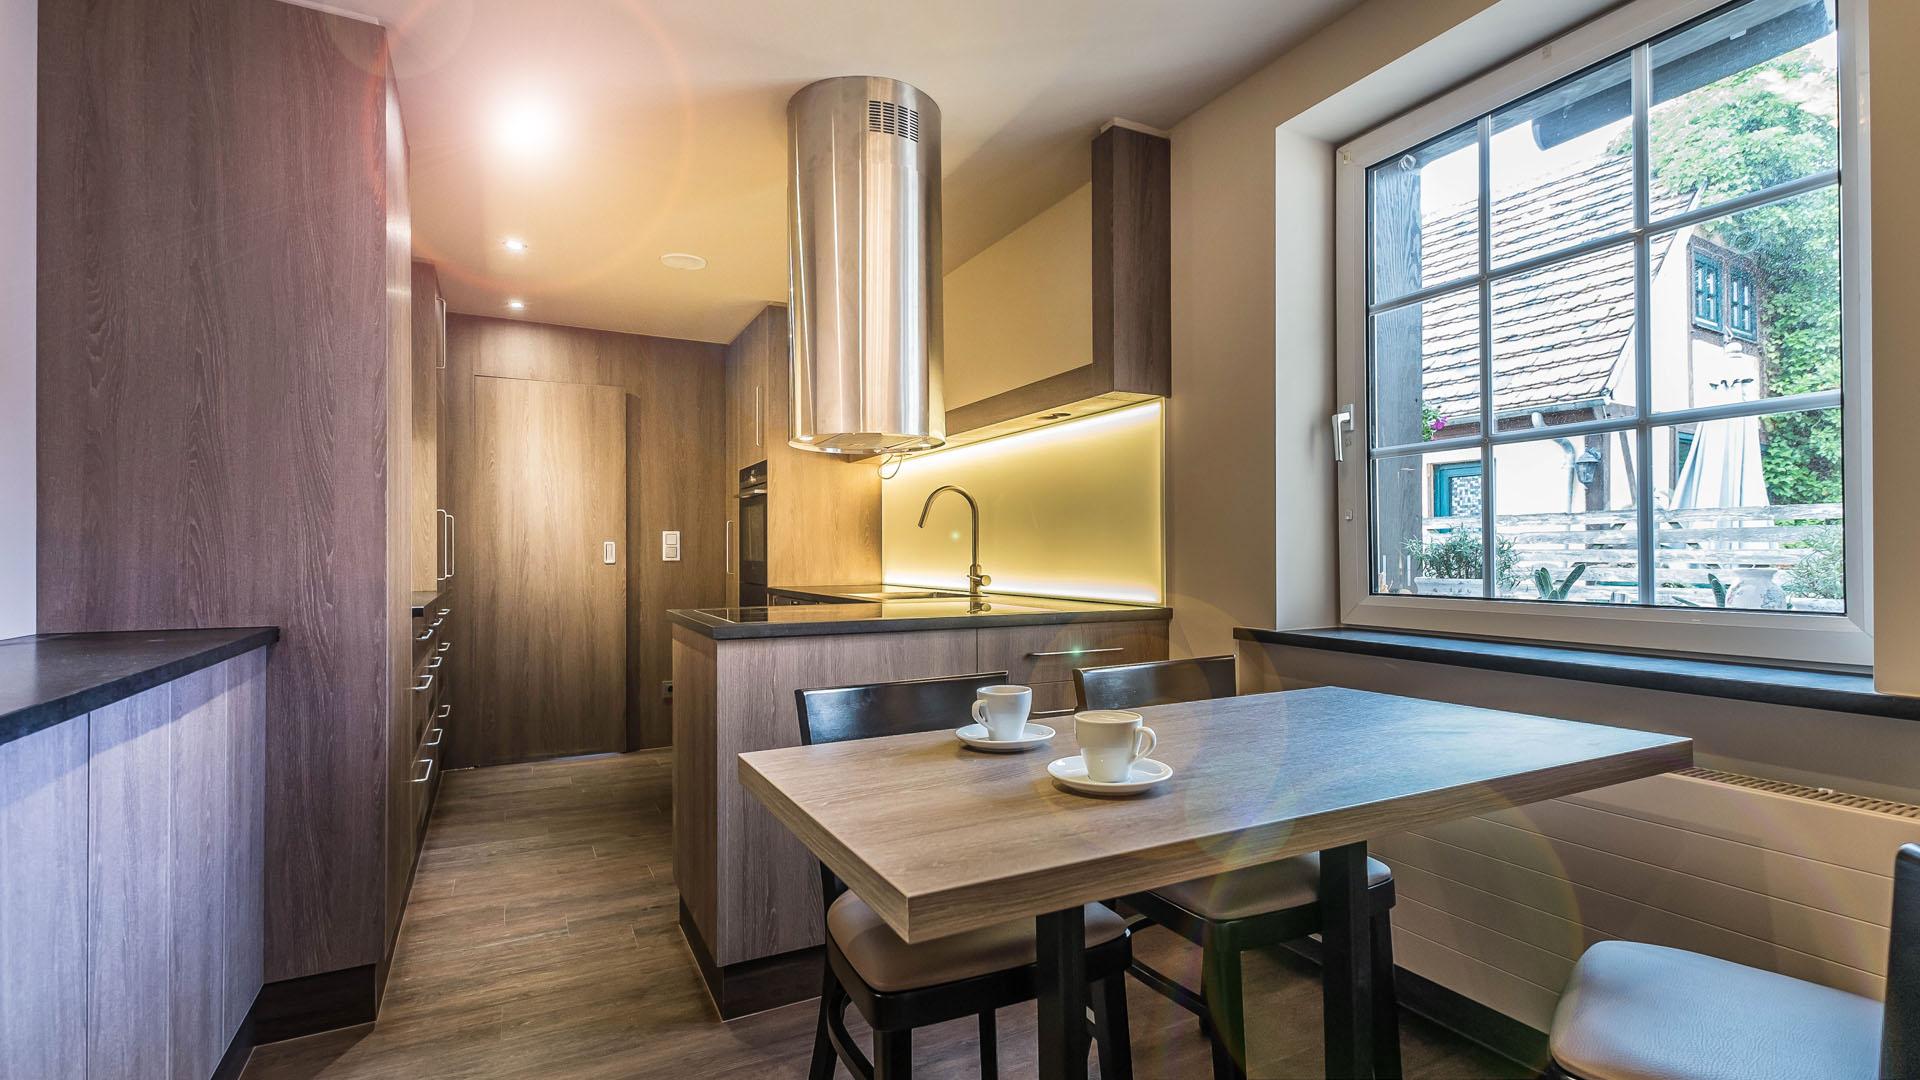 k che nm interieur. Black Bedroom Furniture Sets. Home Design Ideas